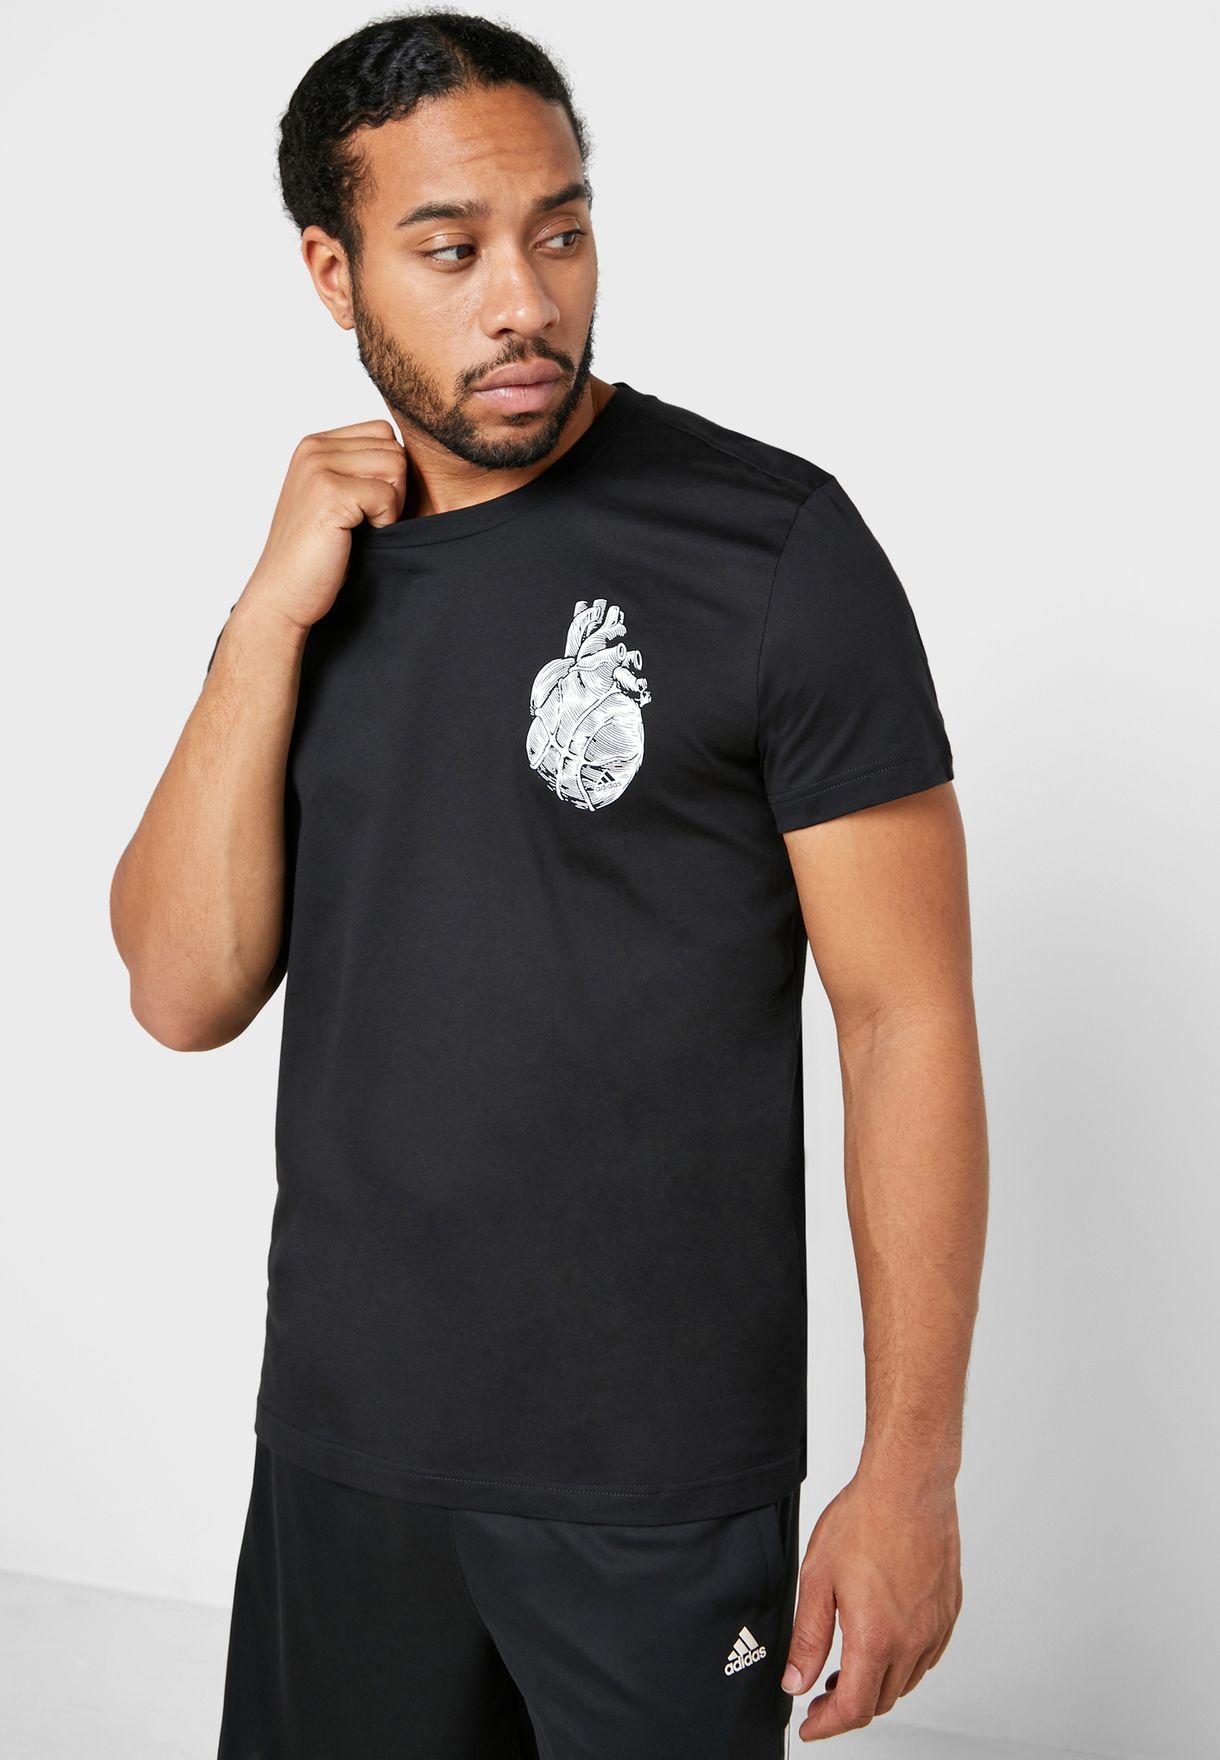 Disgusto negro Converger  Buy adidas black Heart T-Shirt for Men in MENA, Worldwide | FM4973